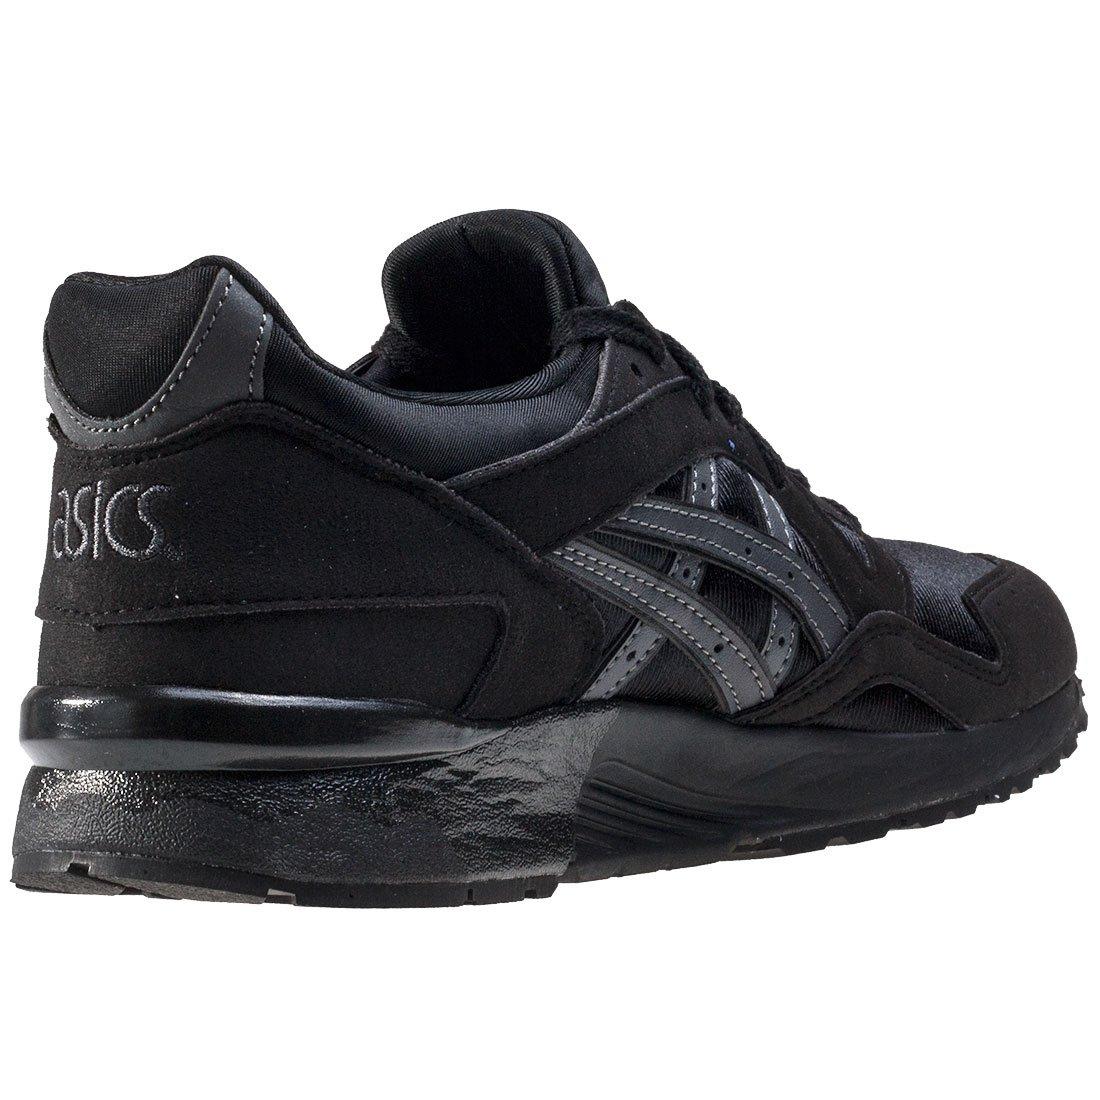 huge discount 55c69 34bc4 ASICS Gel Lyte V GS C541n-9016, Baskets Mixte Enfant  Amazon.fr  Chaussures  et Sacs